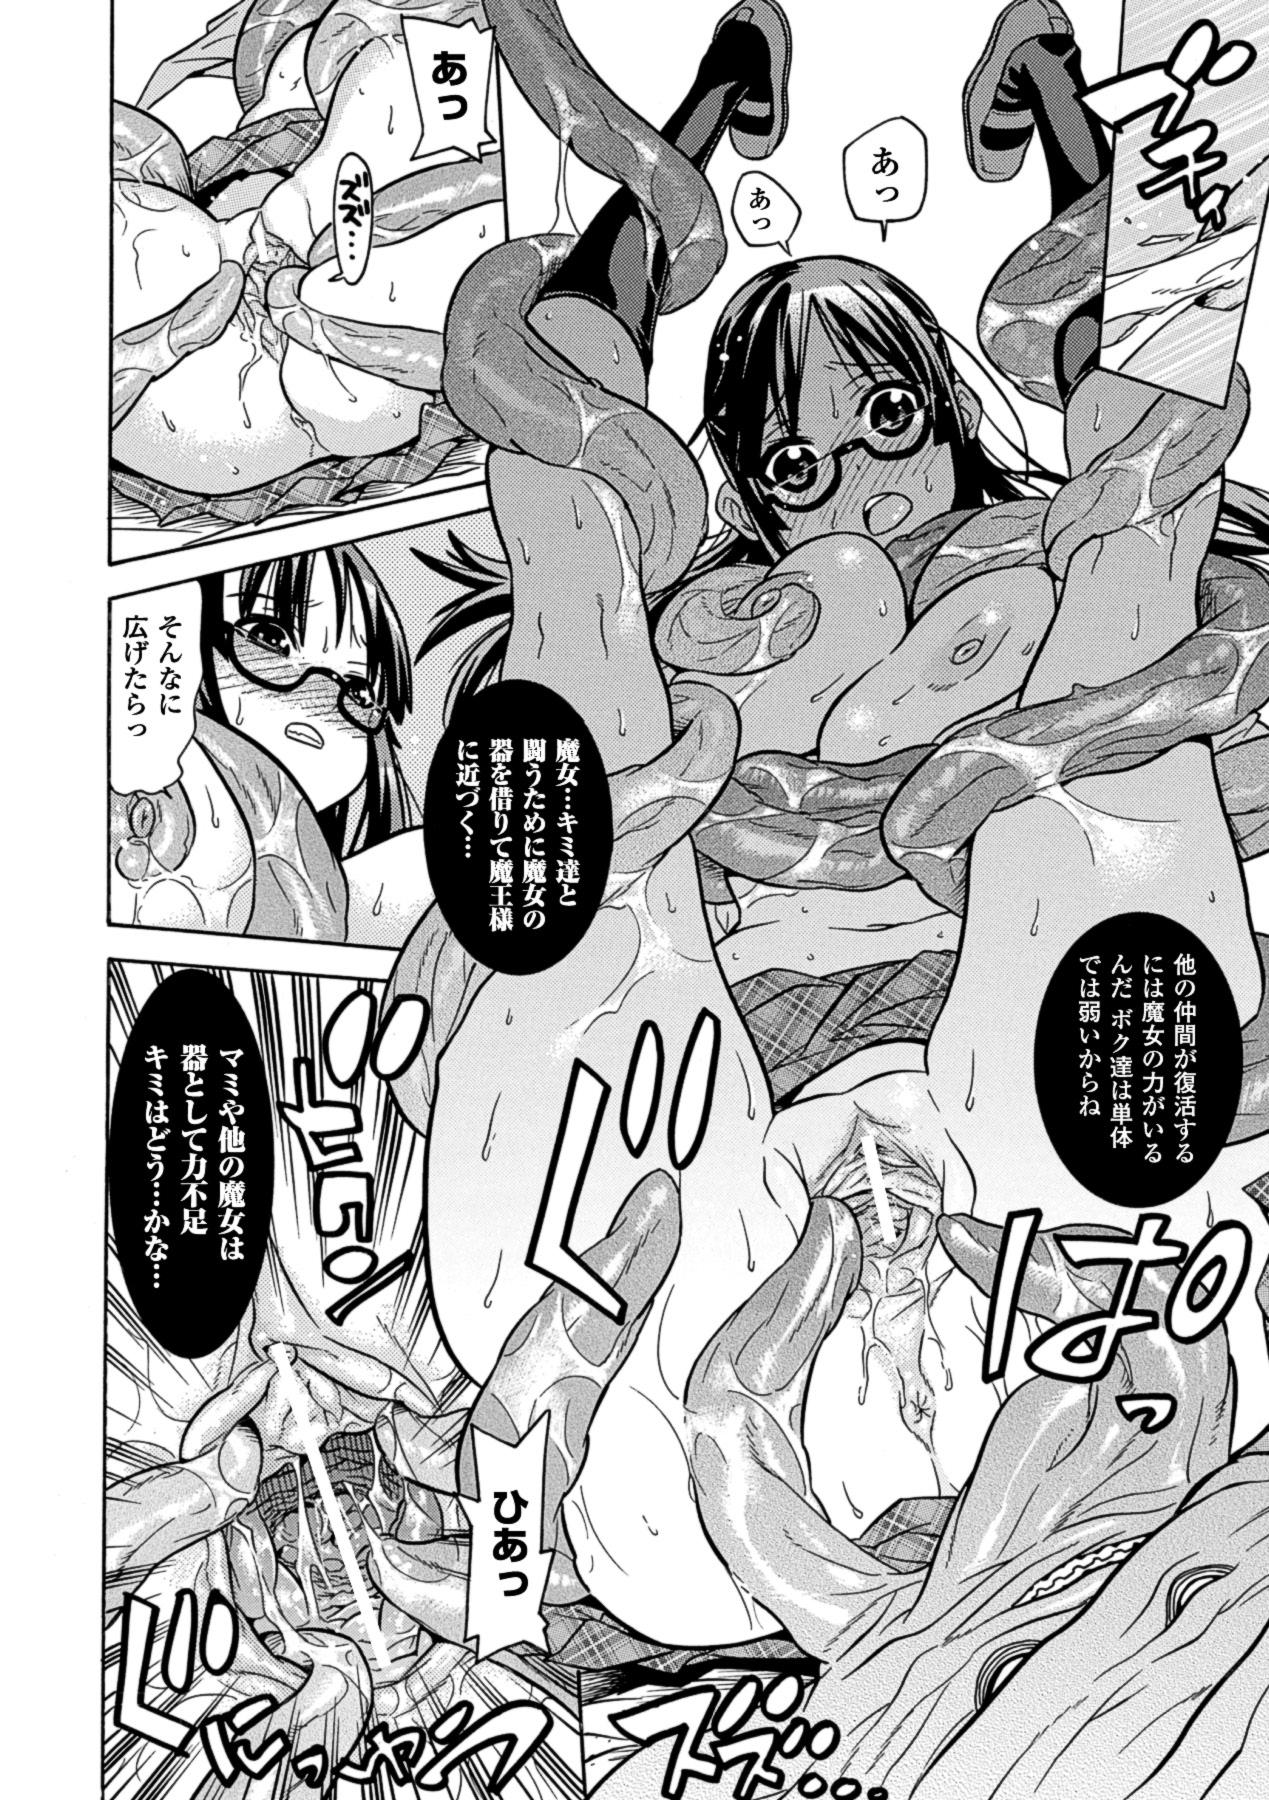 Megami Crisis 10 103